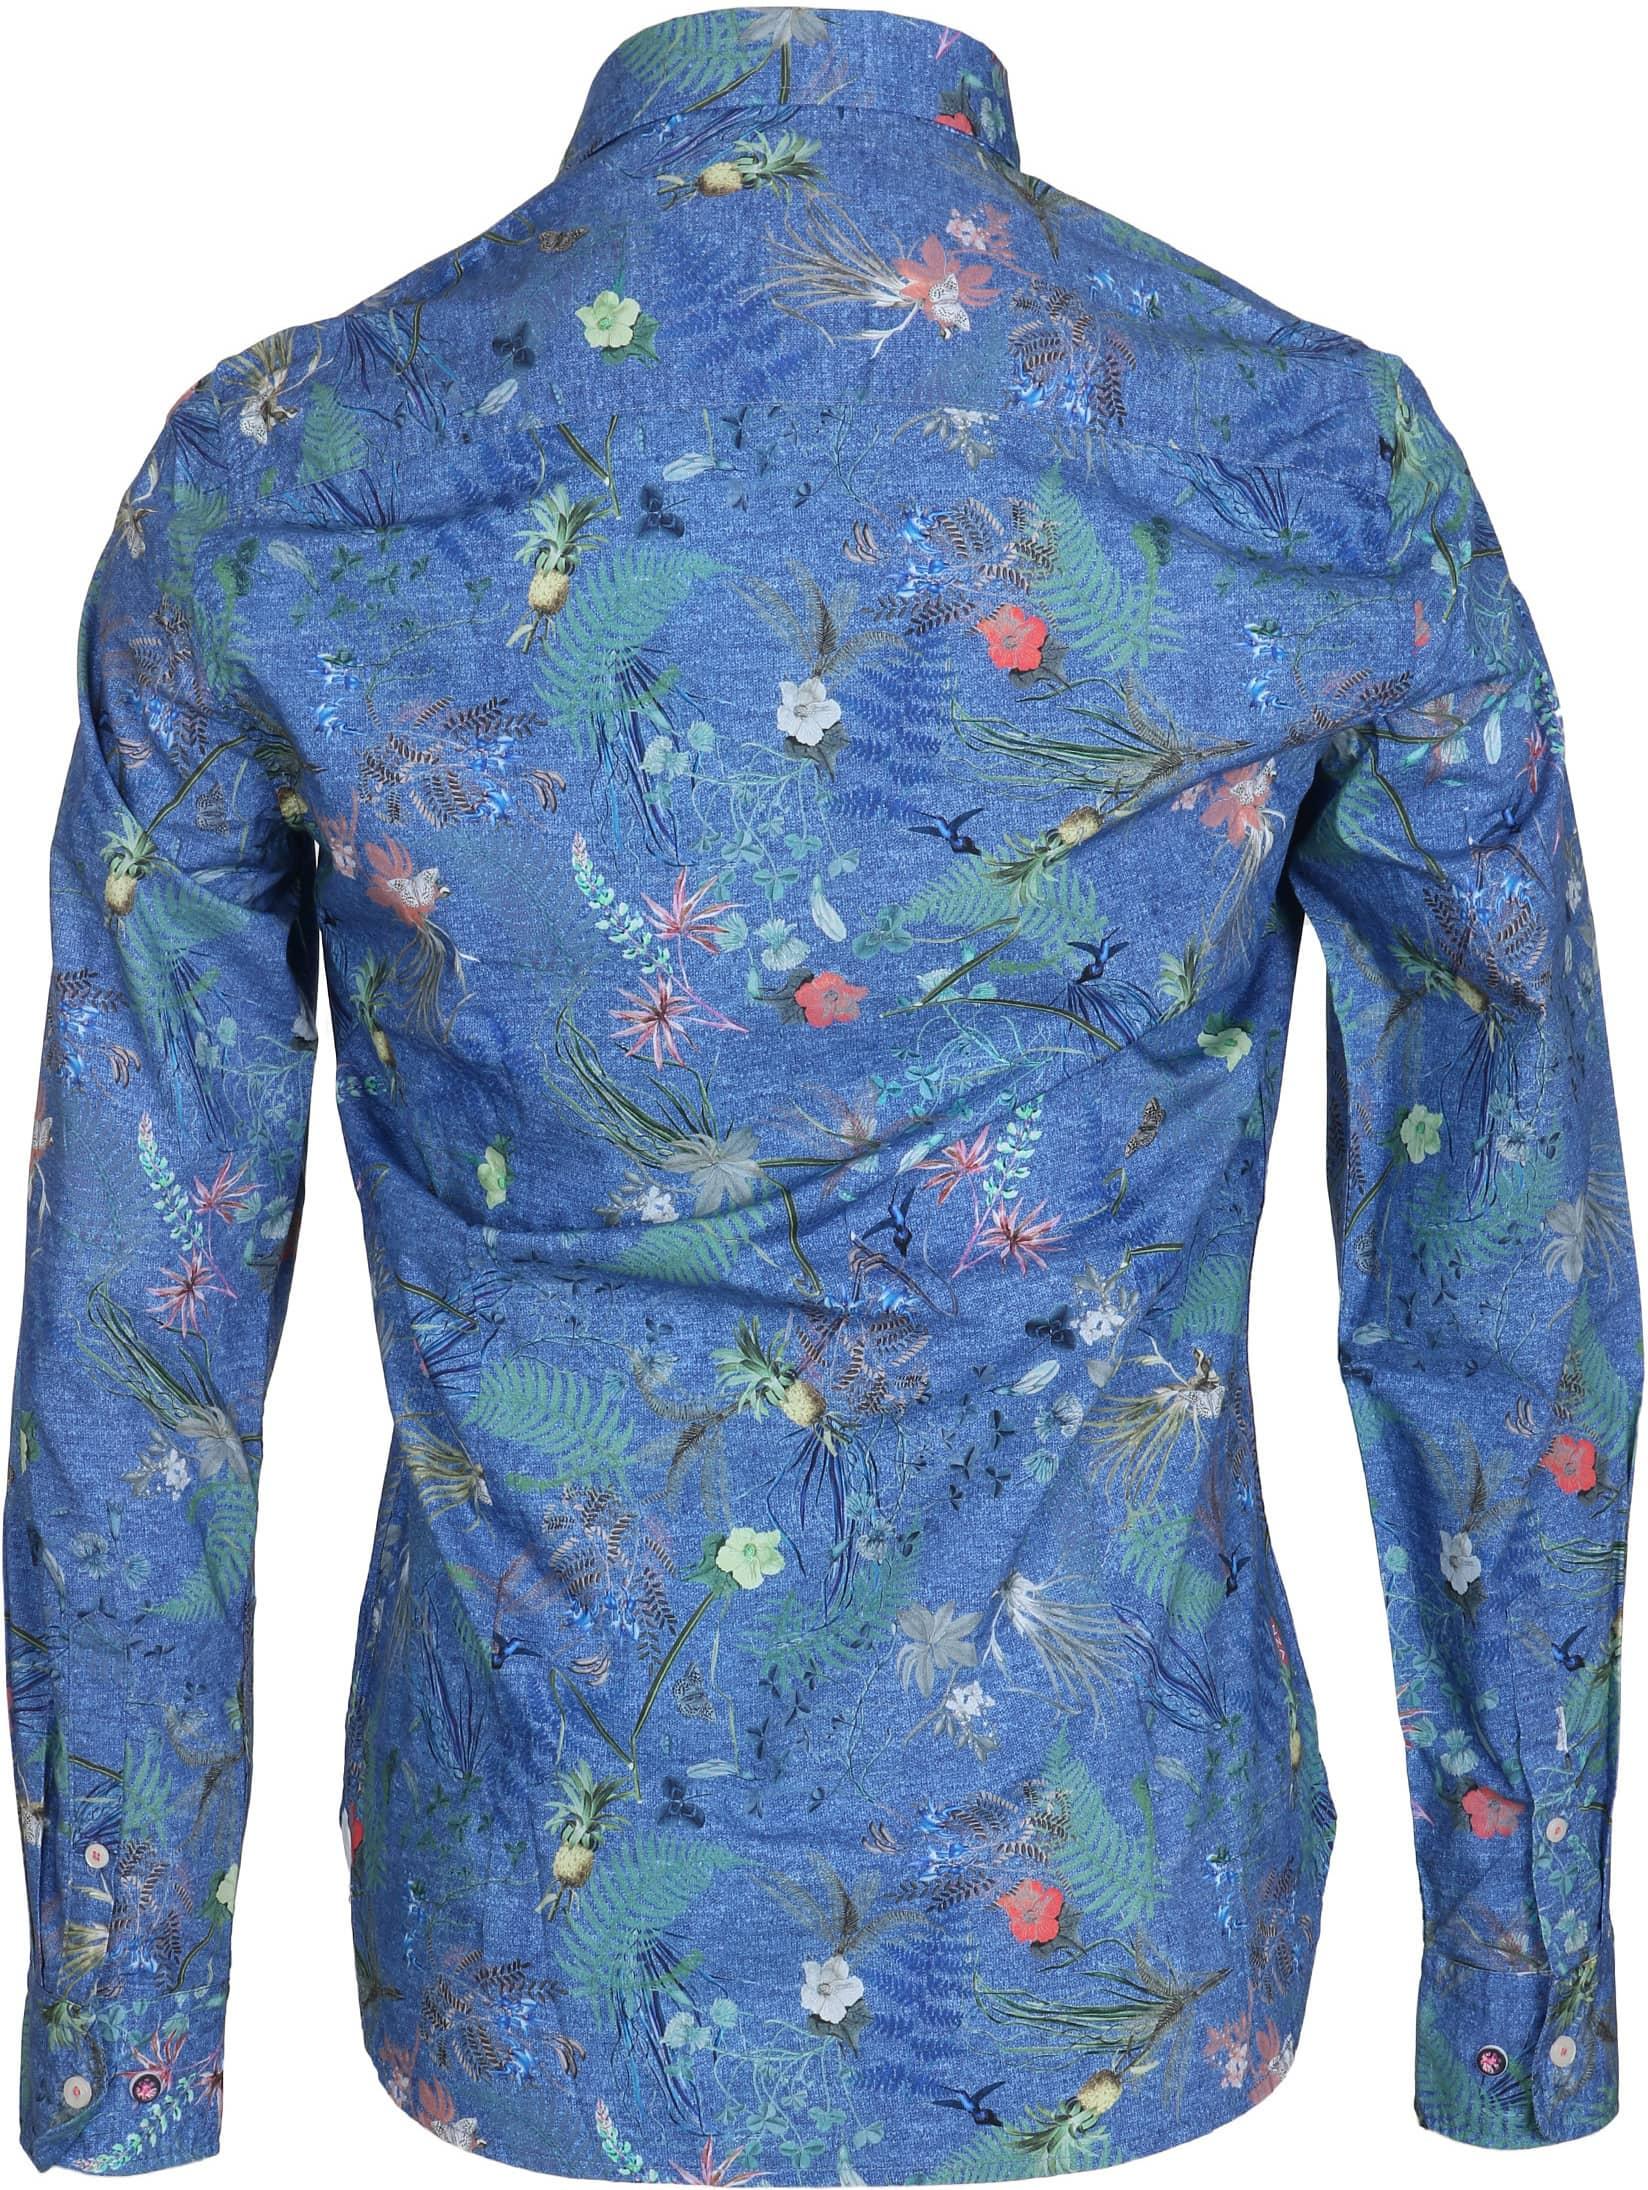 NZA Overhemd Fairhall Blauw Print foto 2